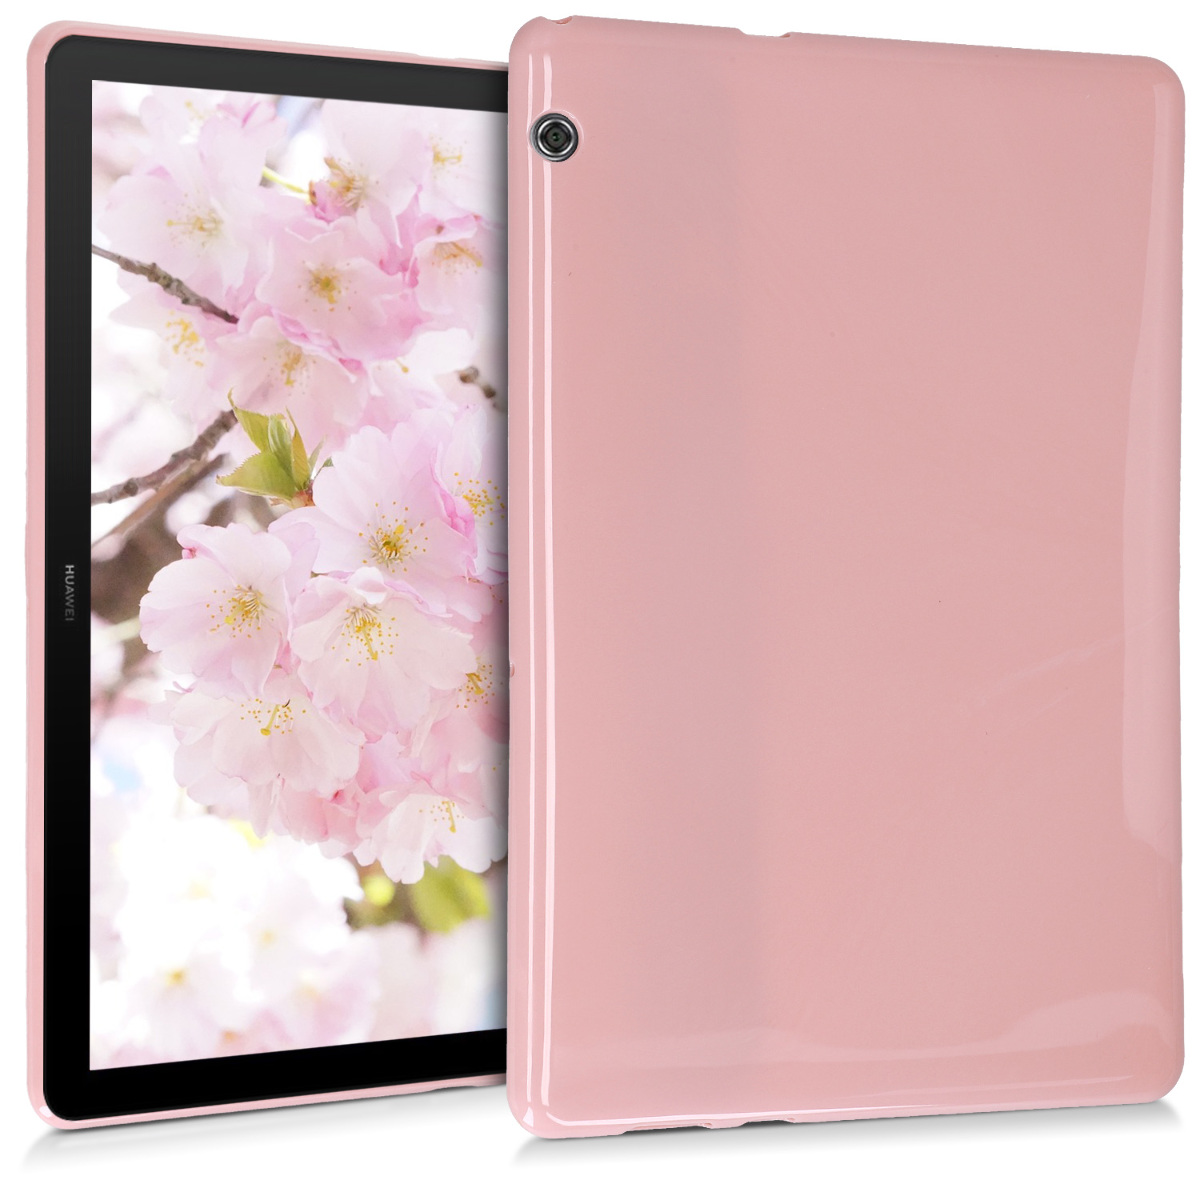 KW Θήκη Σιλικόνης Huawei MediaPad T5 10.1'' - Dusty Pink (47812.52)